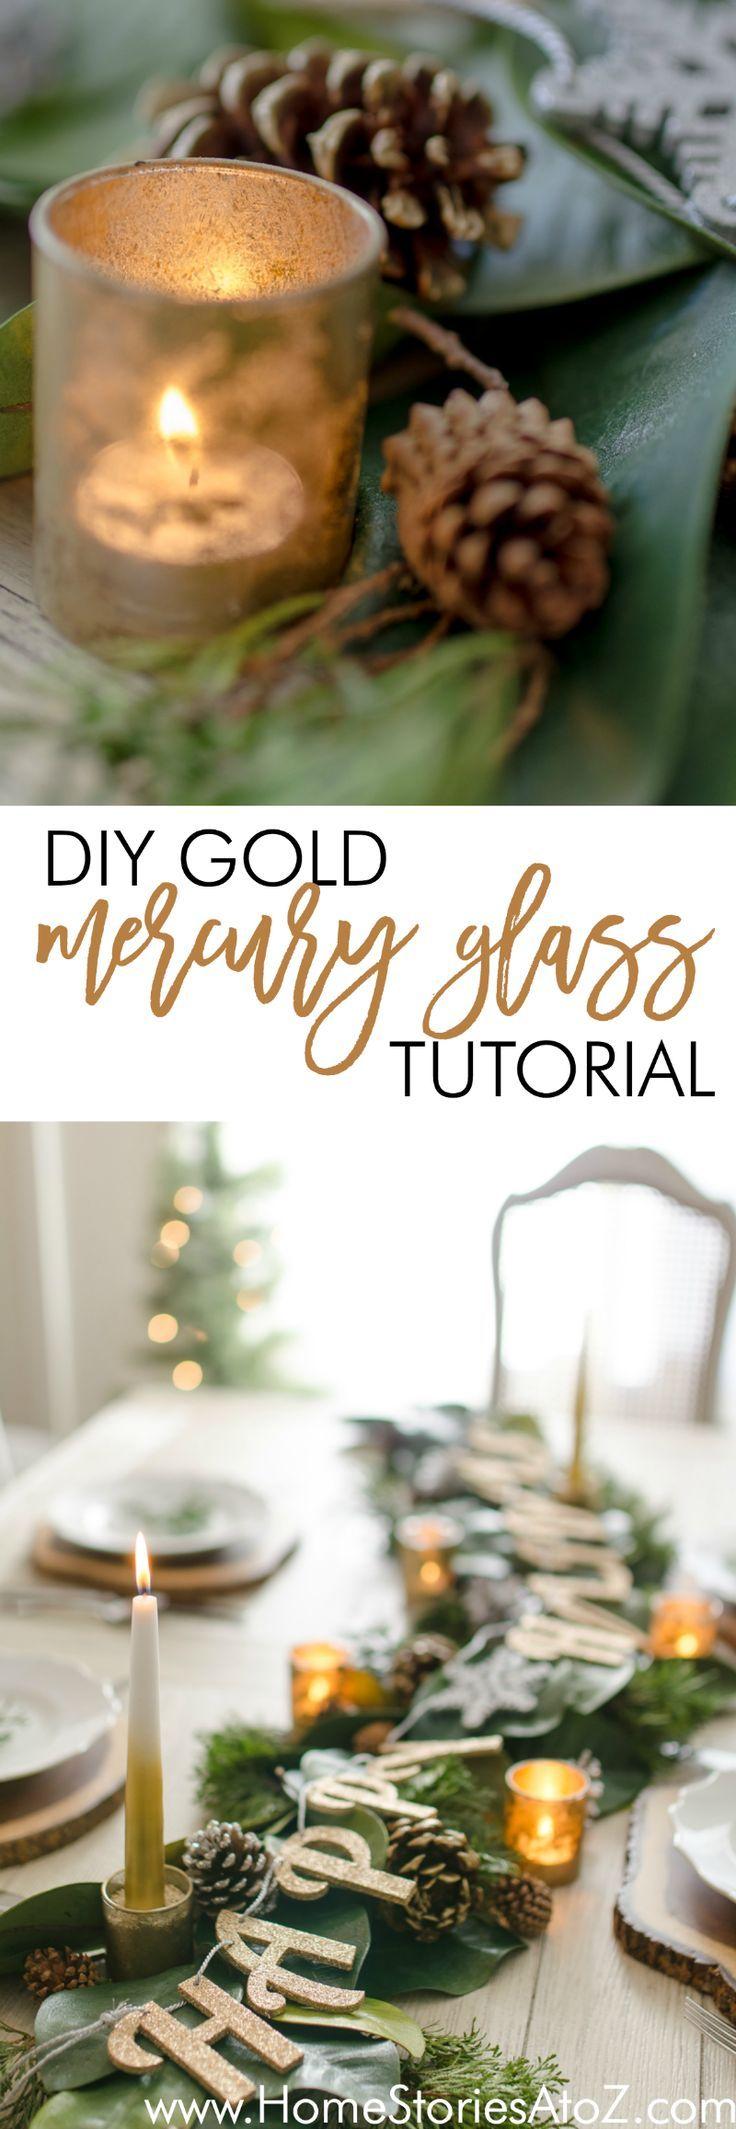 234 best glam diy decor and crafts images on pinterest crafts diy mercury glass tutorial